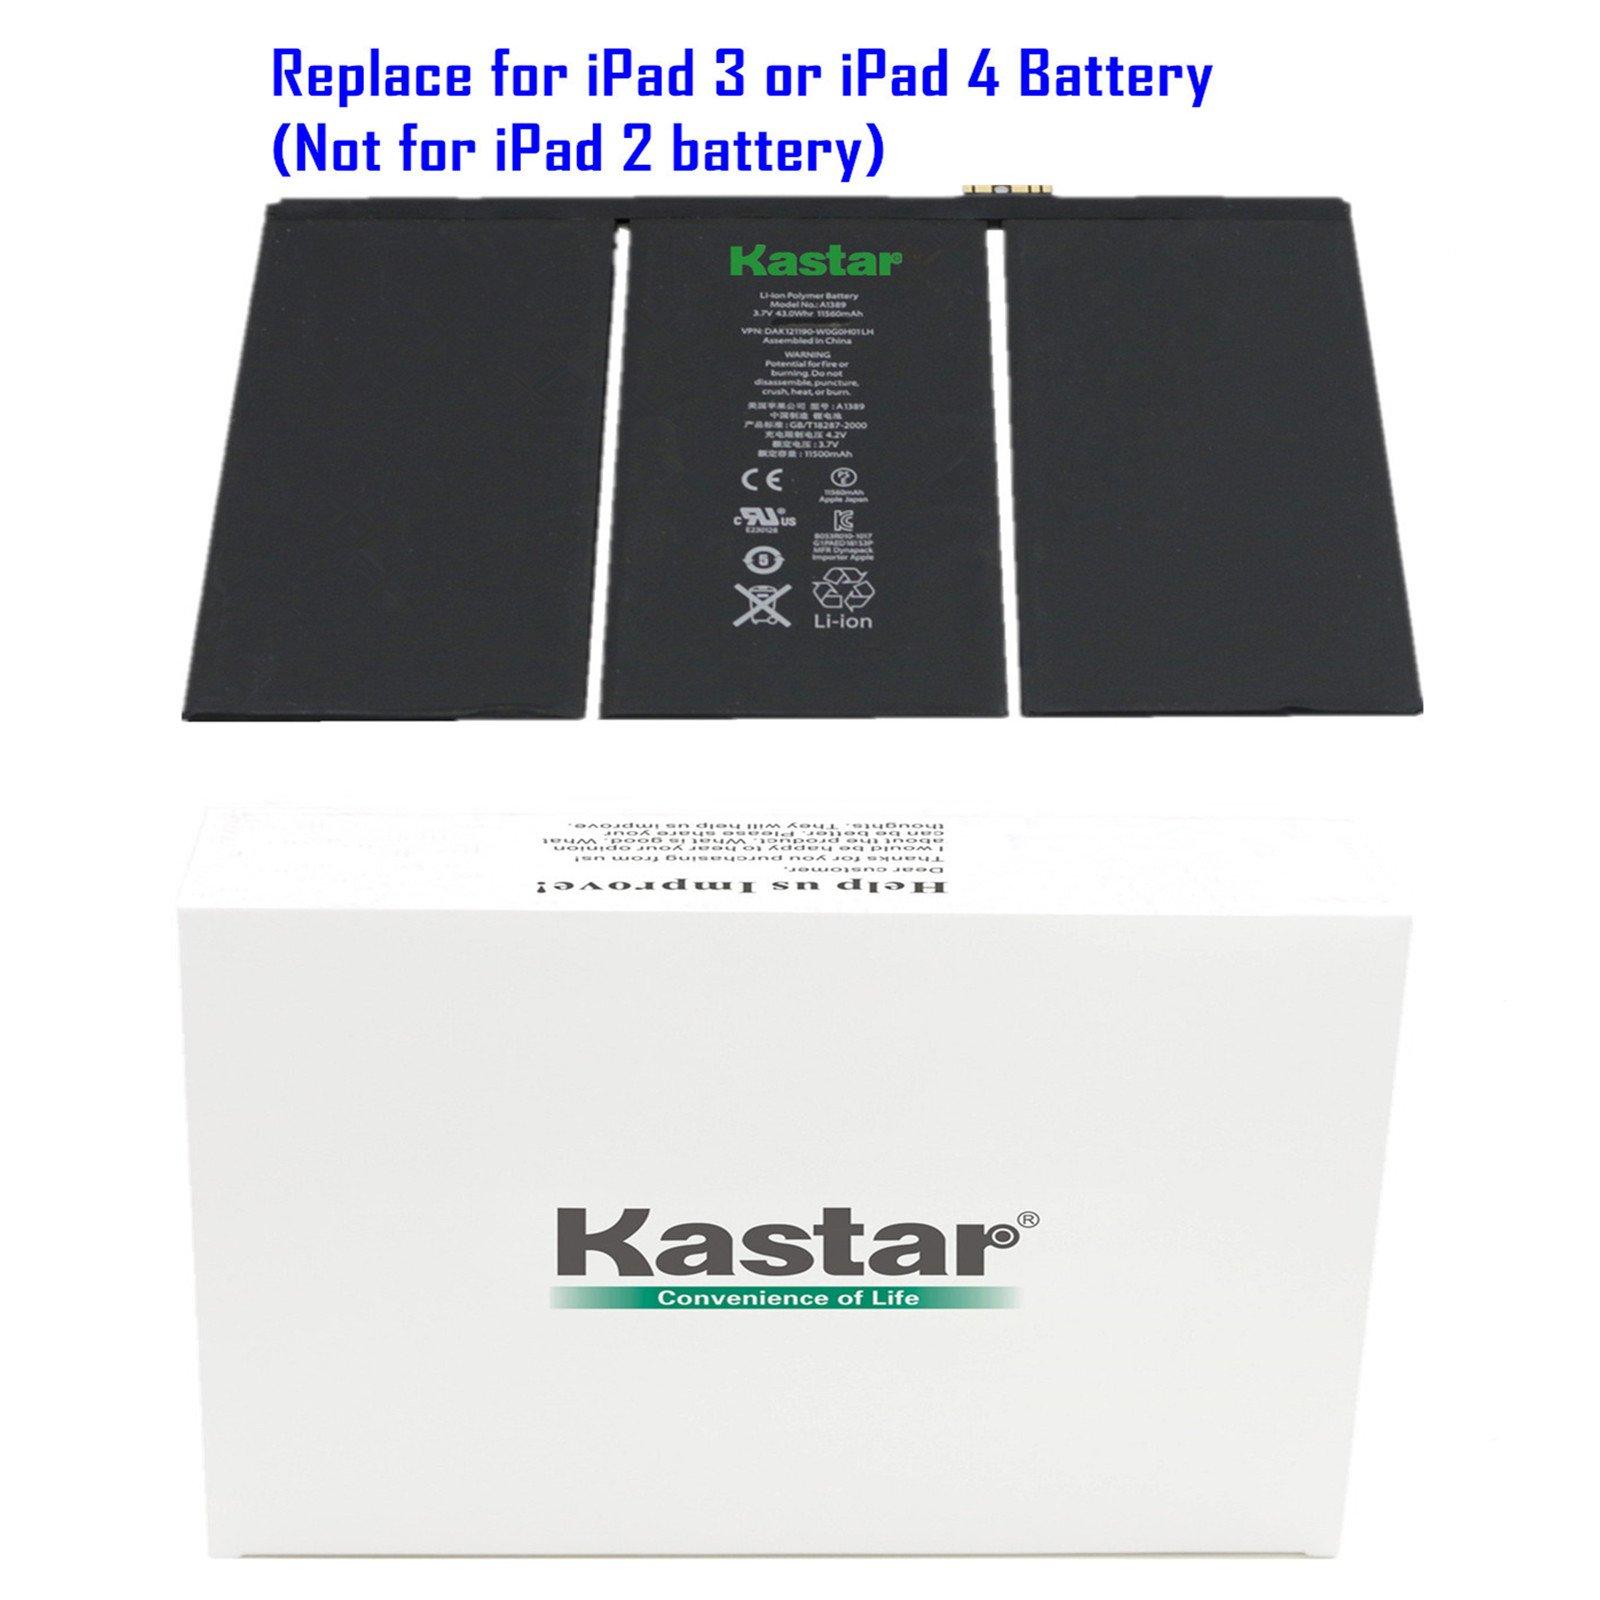 Kastar Battery for Apple iPad 3 (3rd Generation iPad) and iPad 4 (4th Generation iPad) Replacement Internal Battery 3.7v 43.0WHr 11560mAh Fixes for iPad 3 iPad3 and iPad 4 iPad4